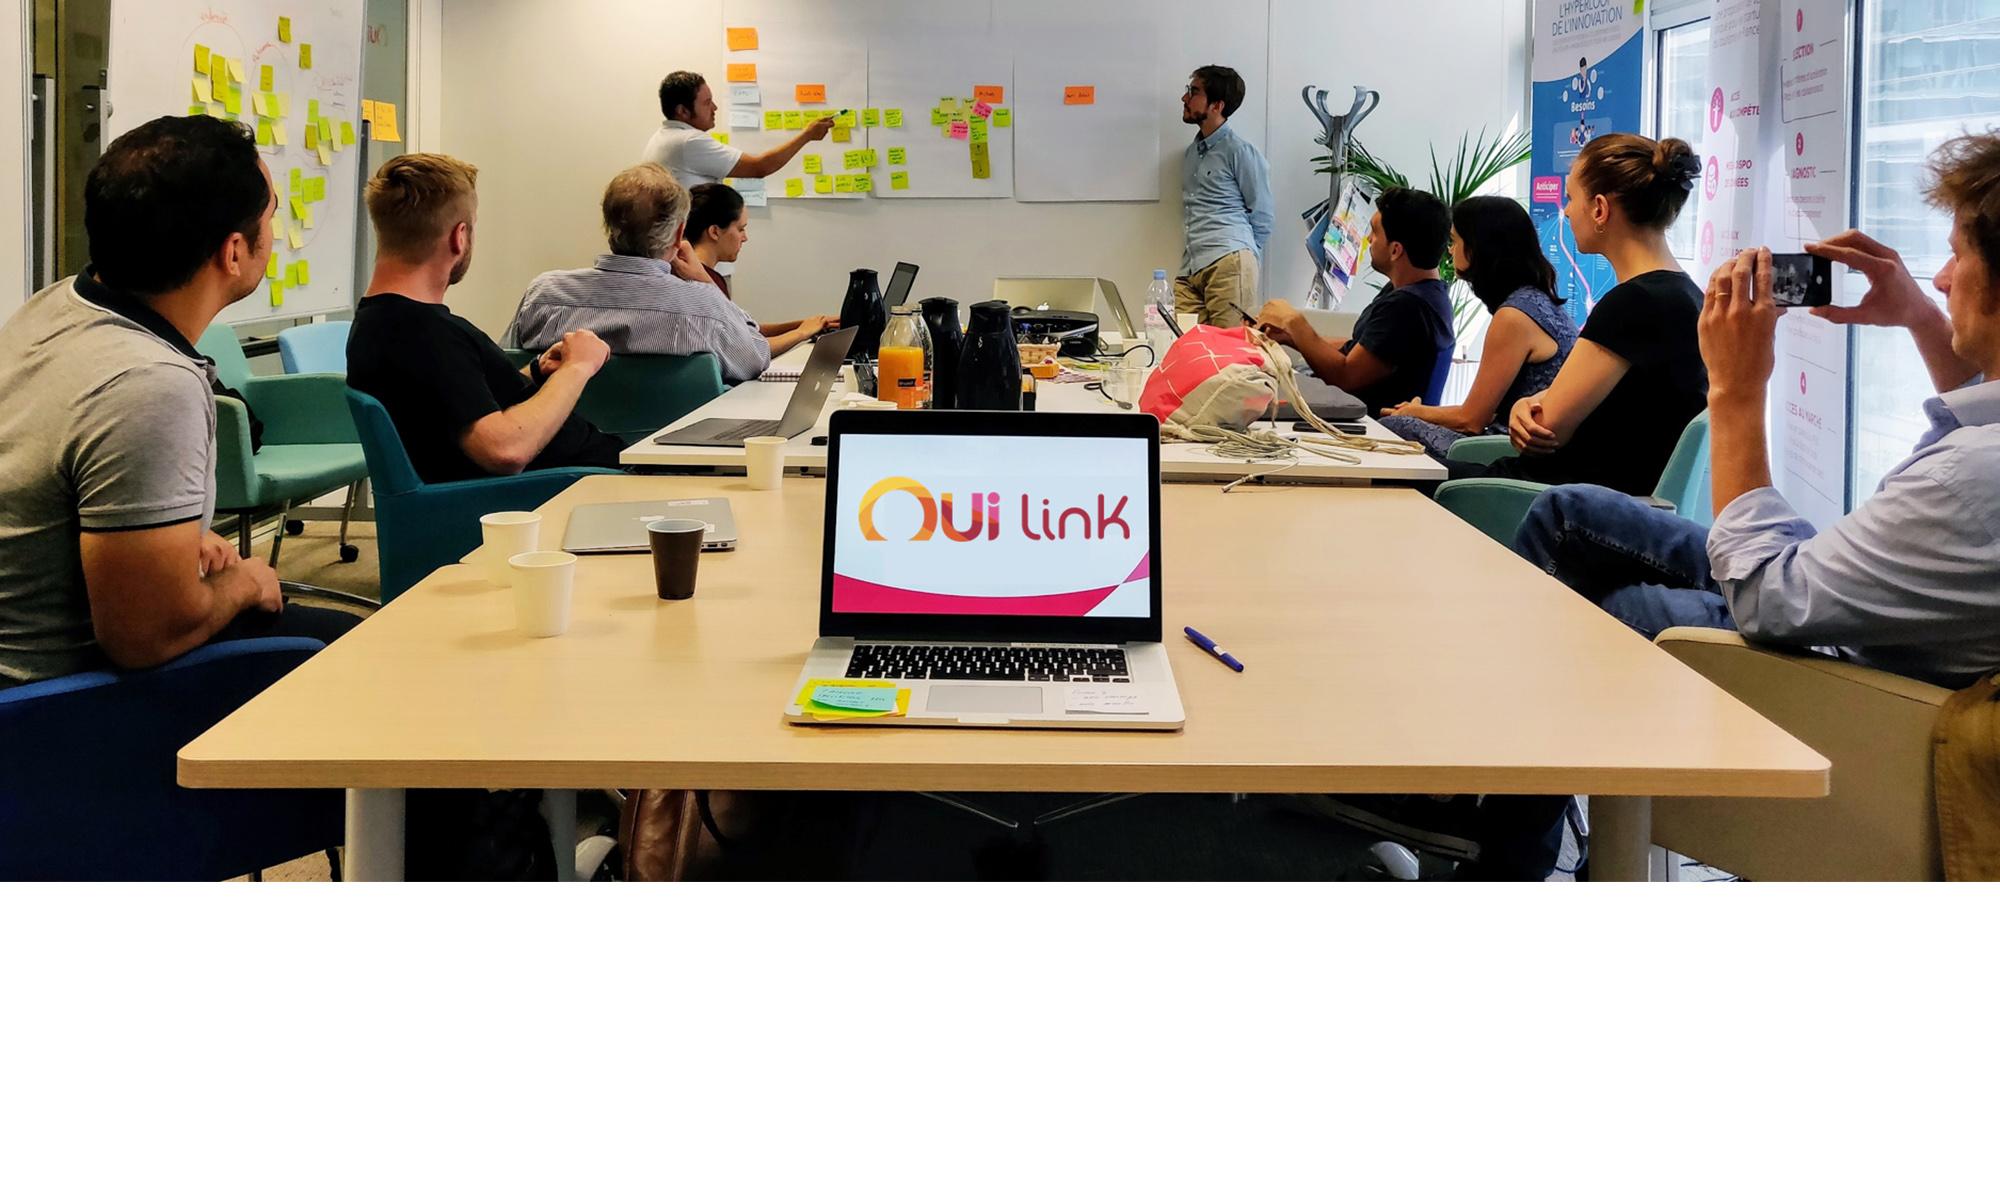 OUITalk-OUIsncf-OUILink-Startups-Innovation-Accelerateur_copie.jpg